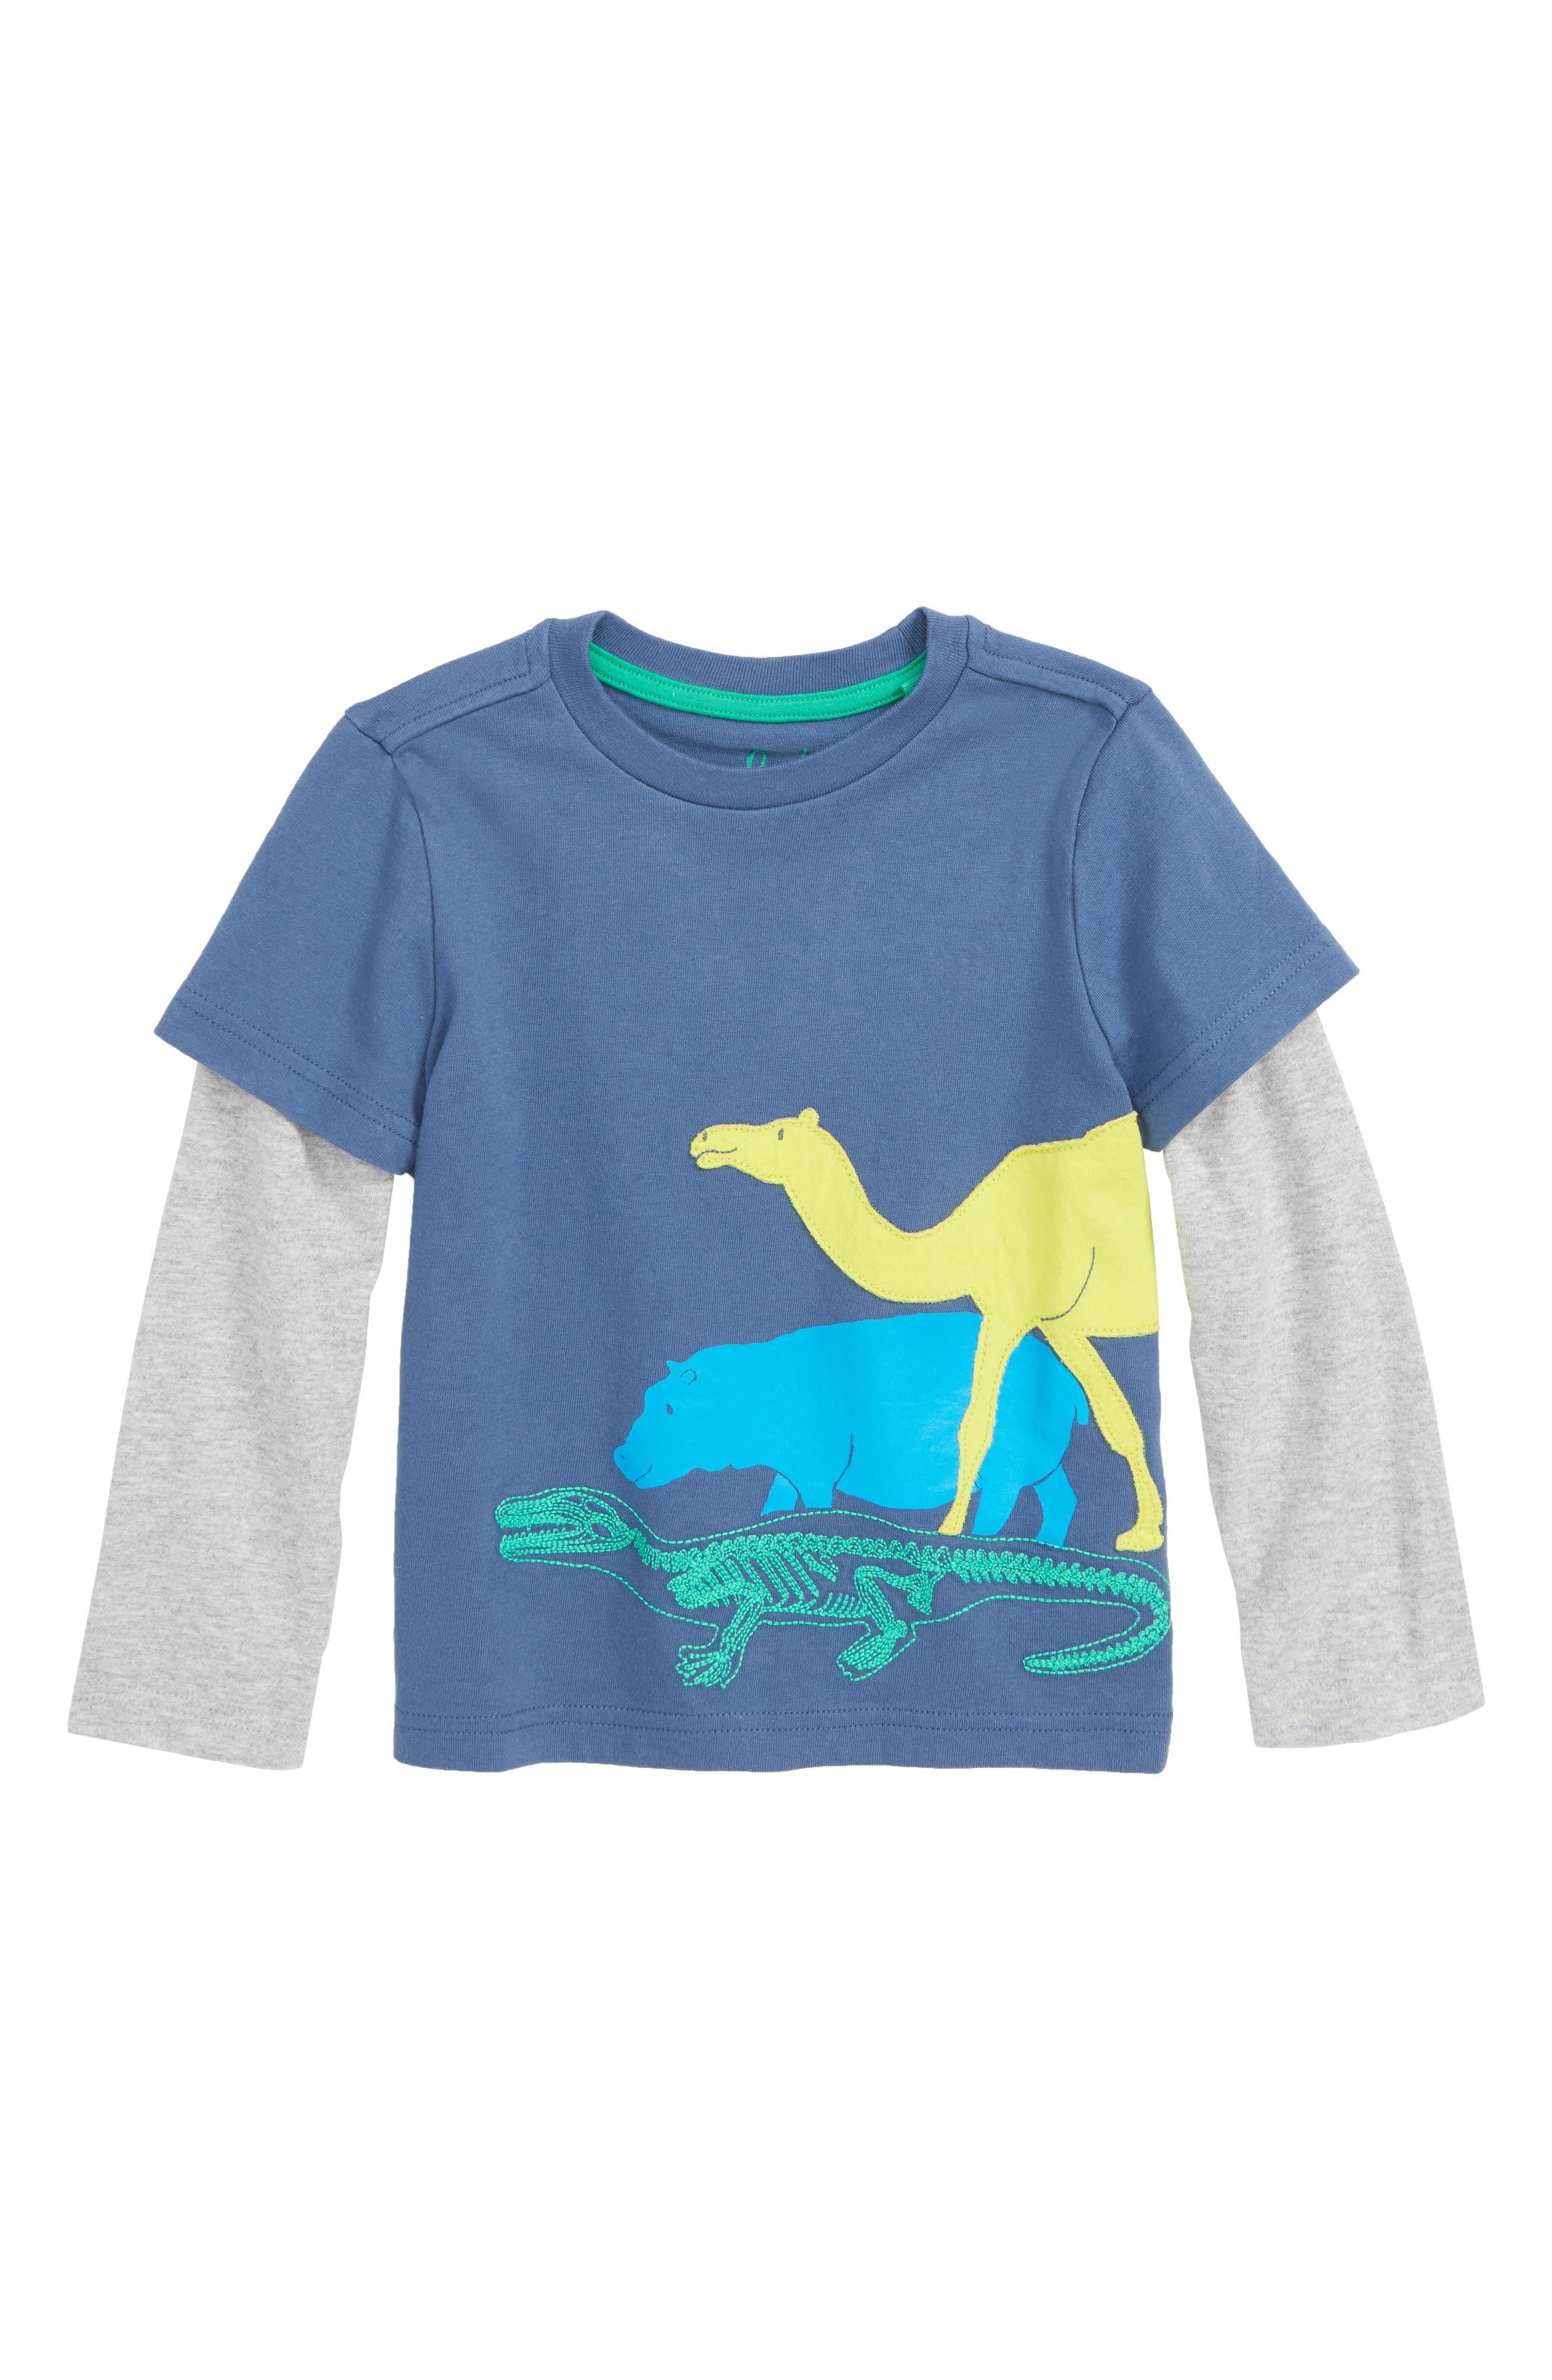 Textured Mammals Layered T-Shirt, Main, color, LAGOON BLUE